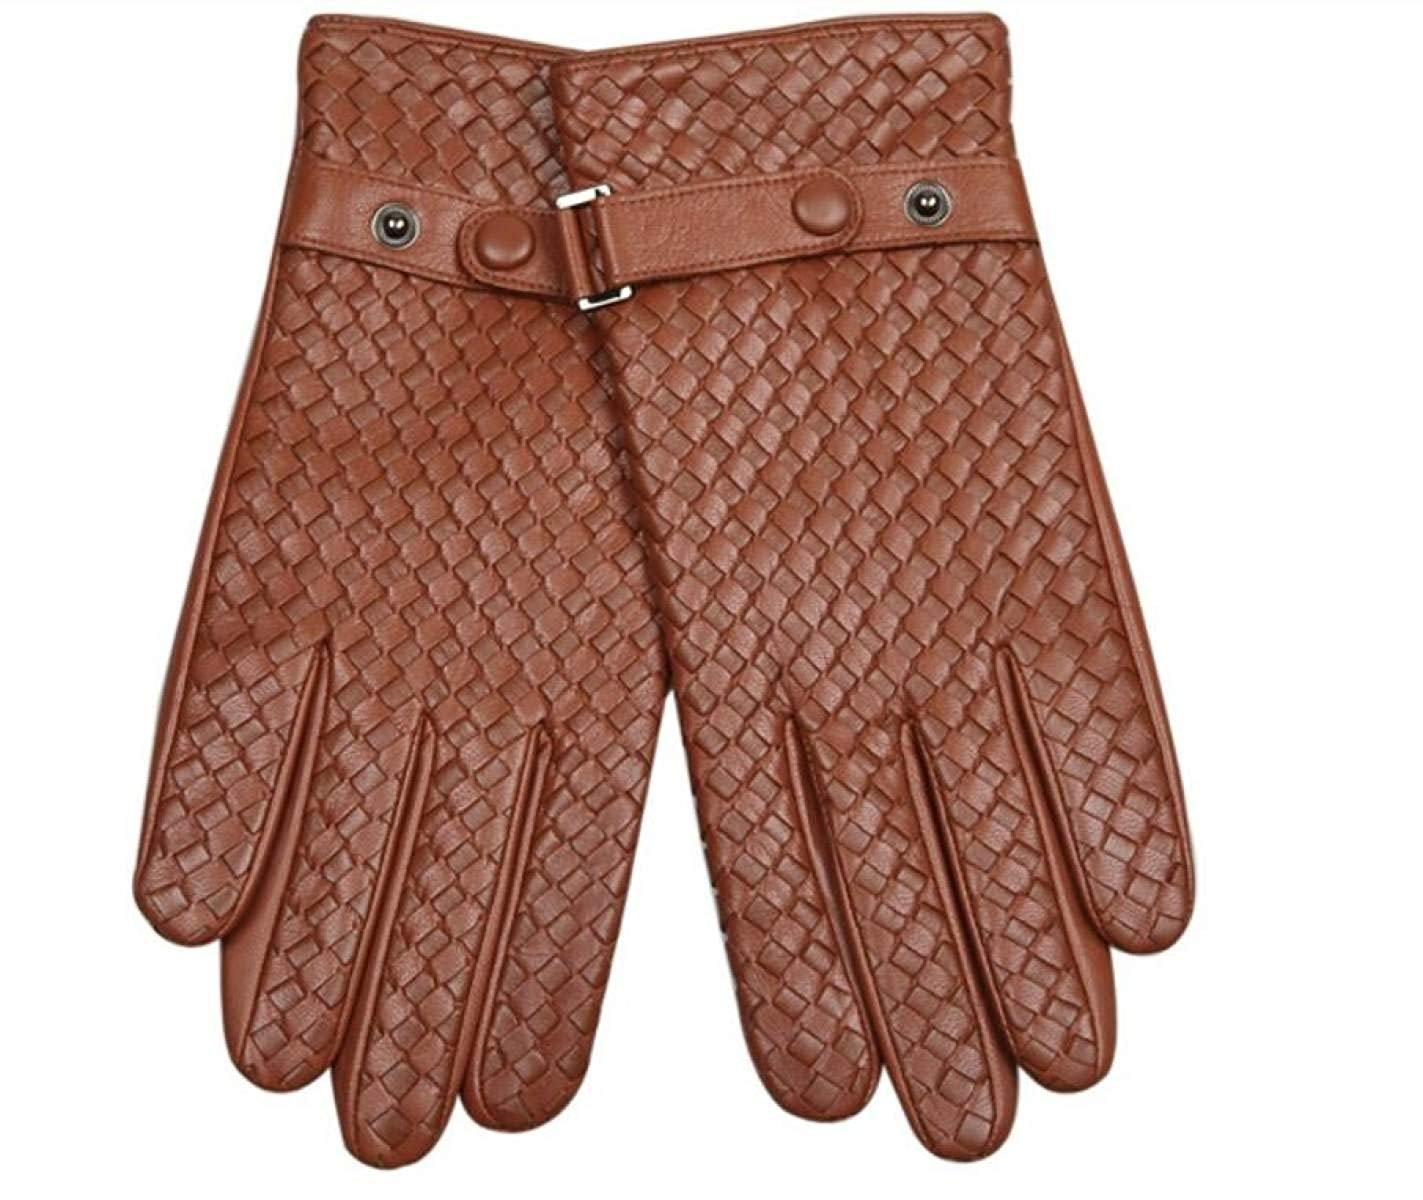 CWJ Men's Suede Leather Gloves Weaving Winter Warmth,Brown,Medium